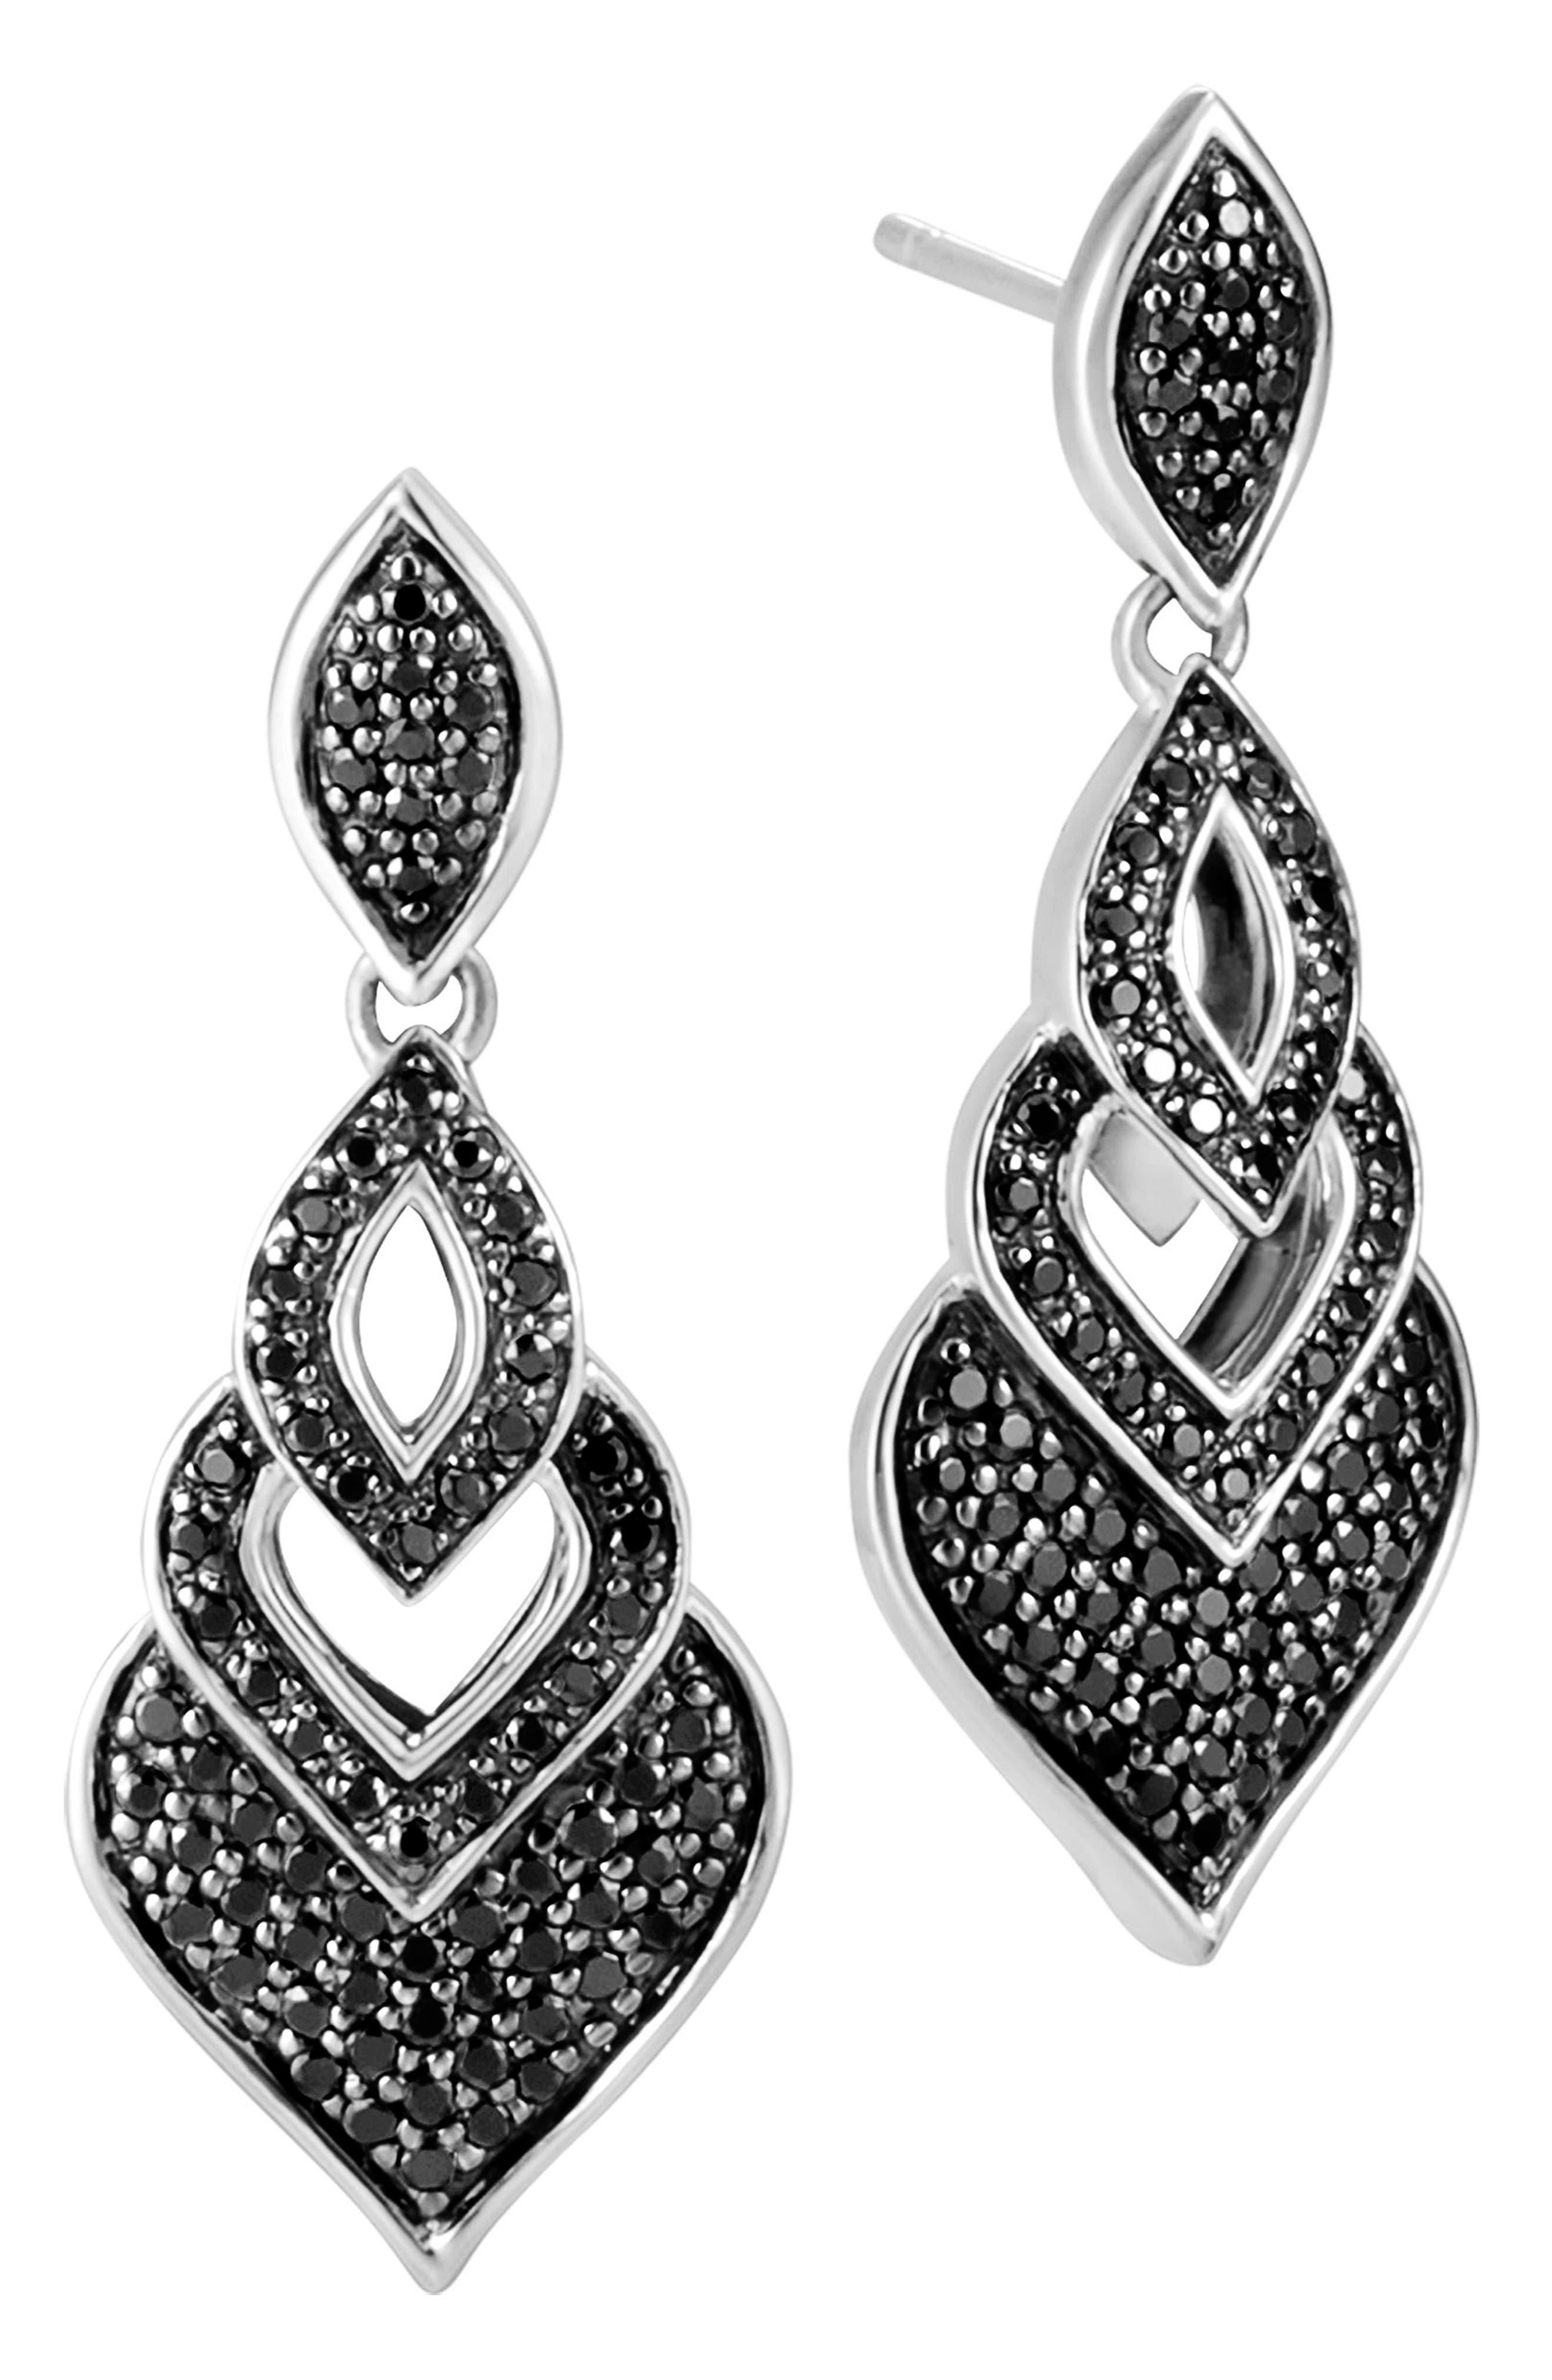 Legends Naga Drop Earrings,                             Main thumbnail 1, color,                             Silver